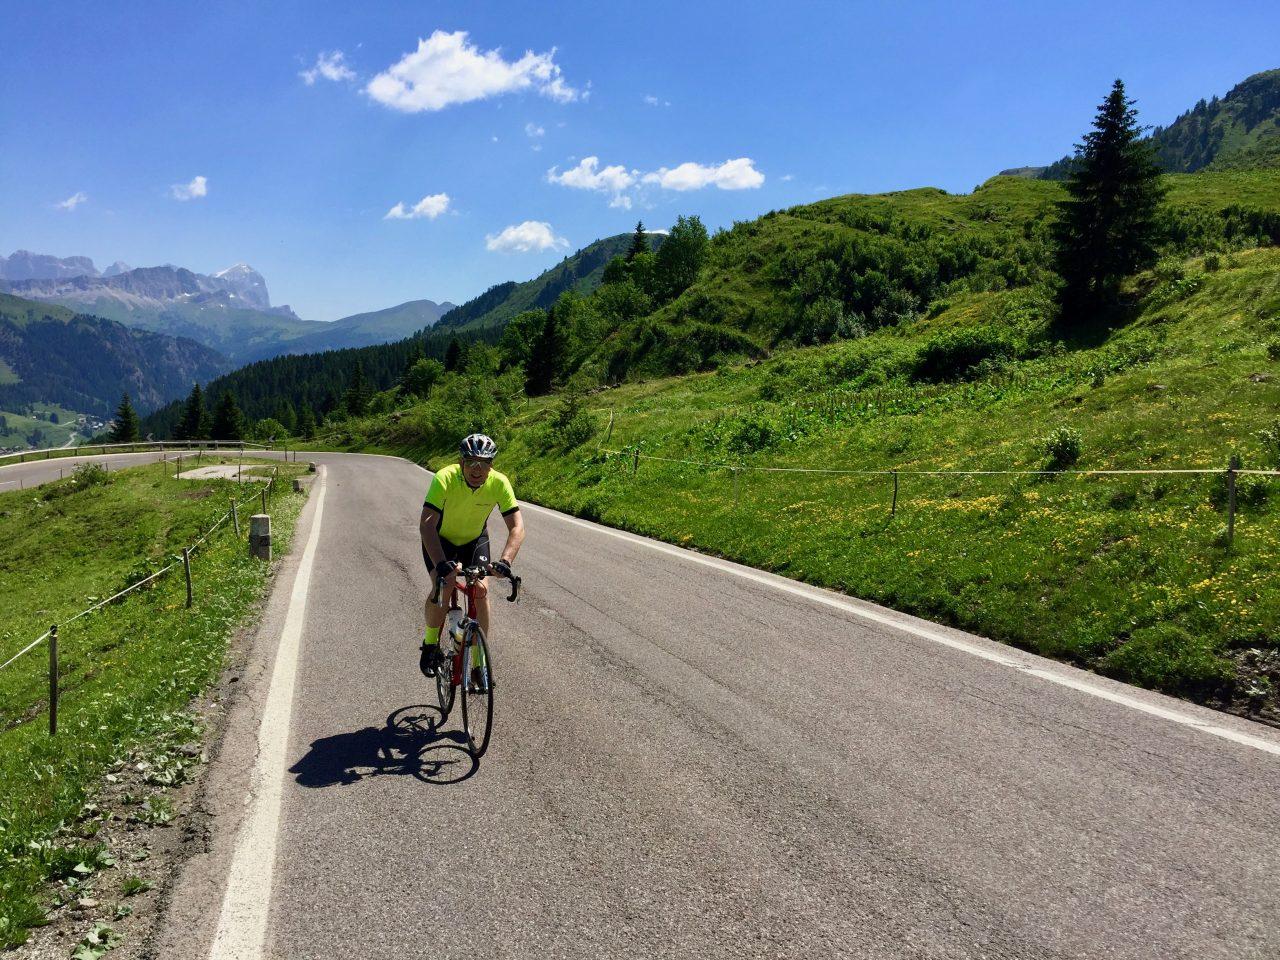 Jürgen, Auffahrt Passo Pordoi, Dolomites, Italy